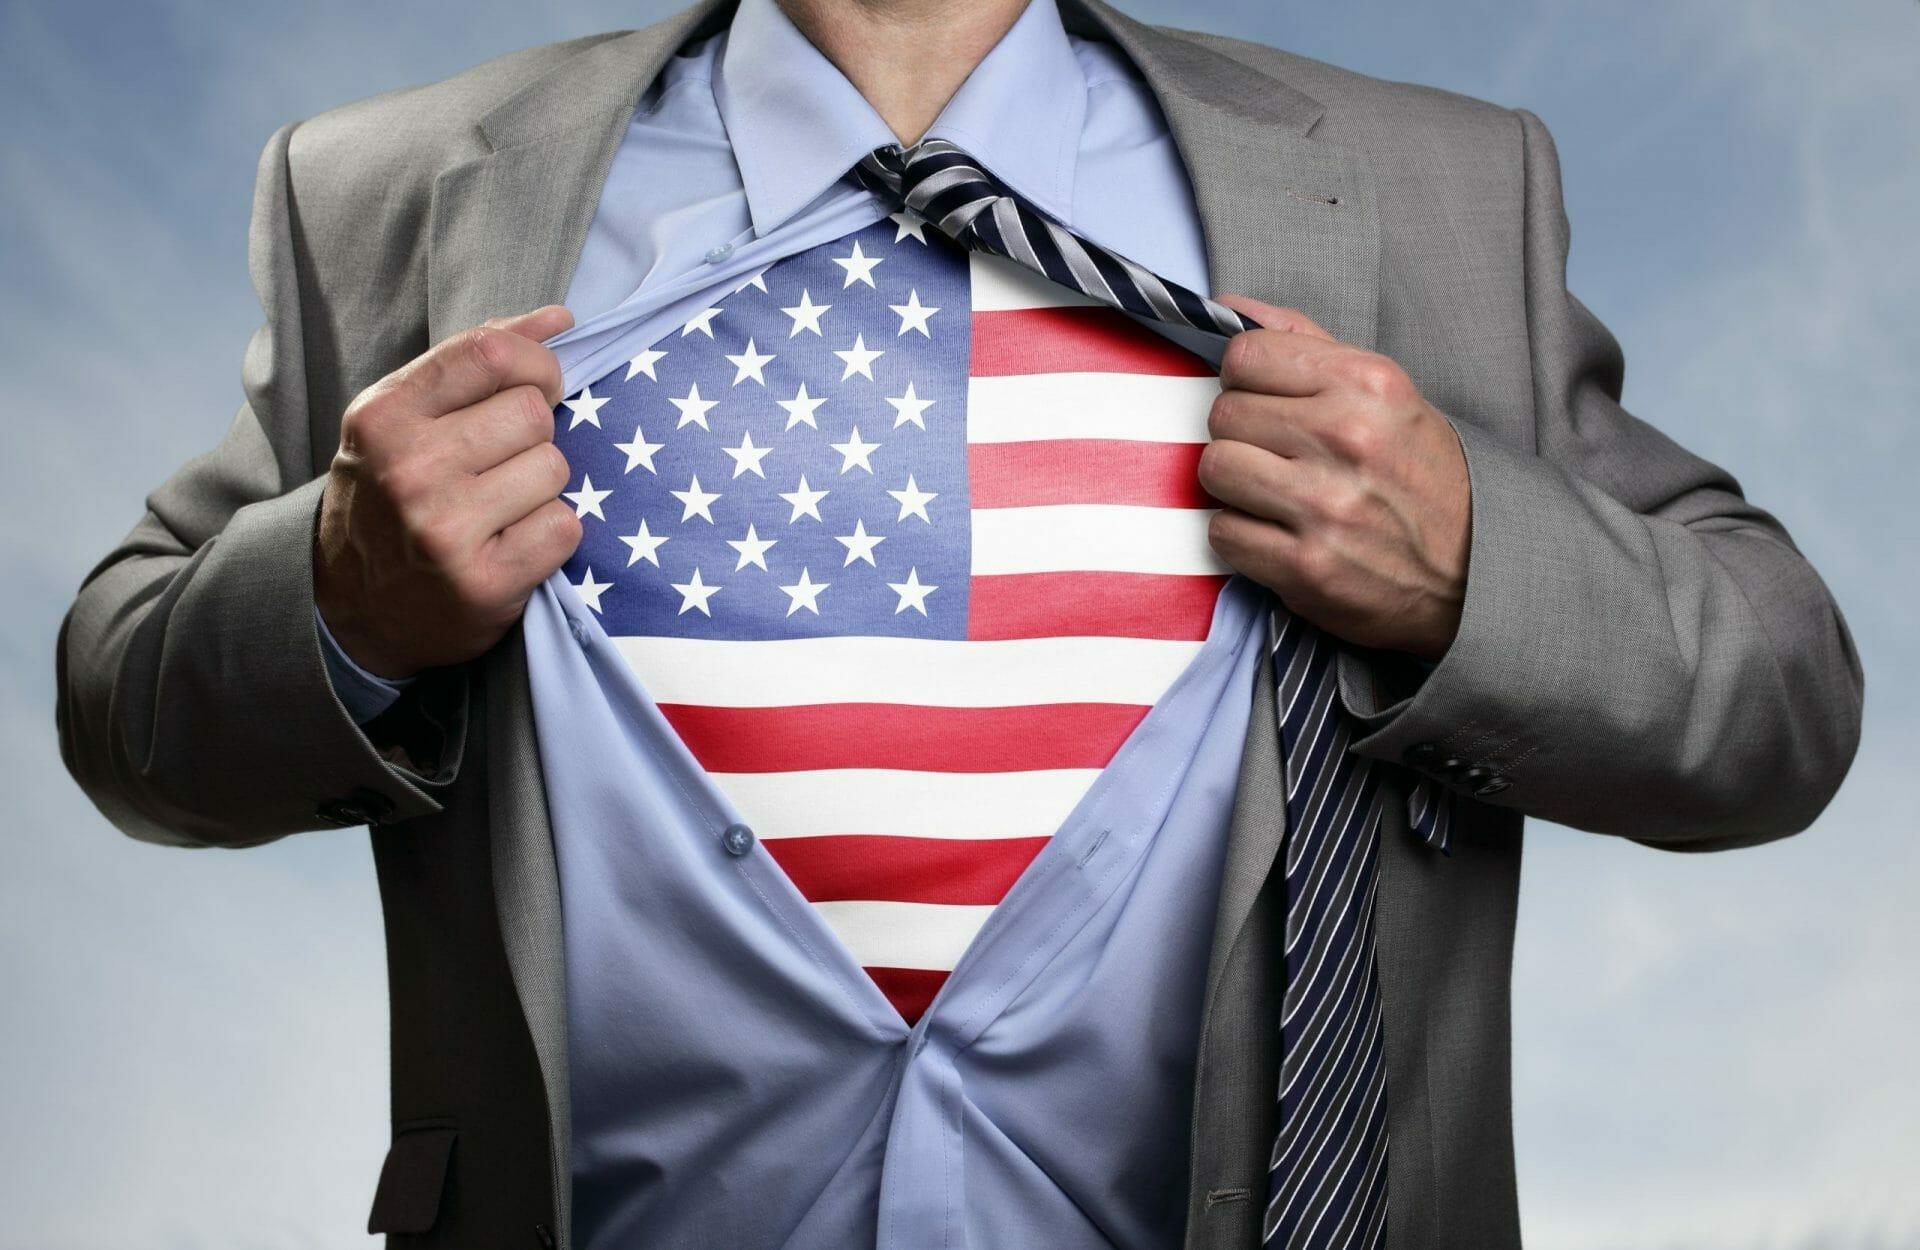 american shirt under business suit